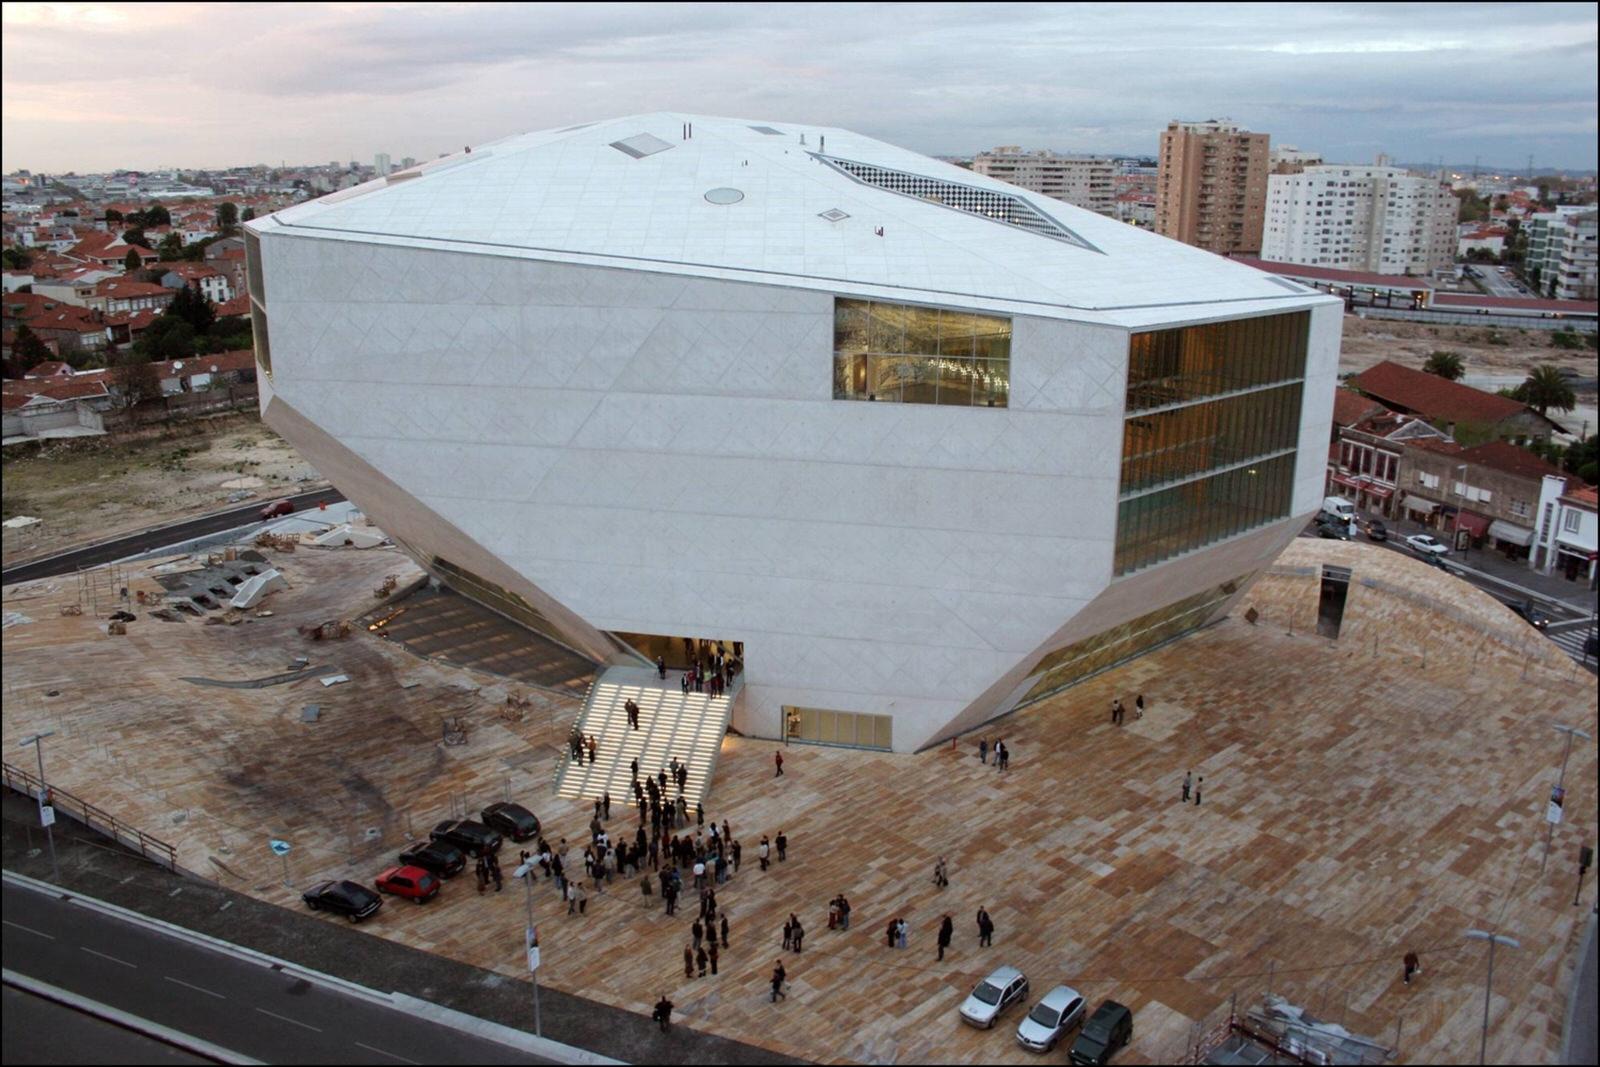 Las mejores obras del arquitecto rem koolhaas timberplan for Piscitelli casa de musica